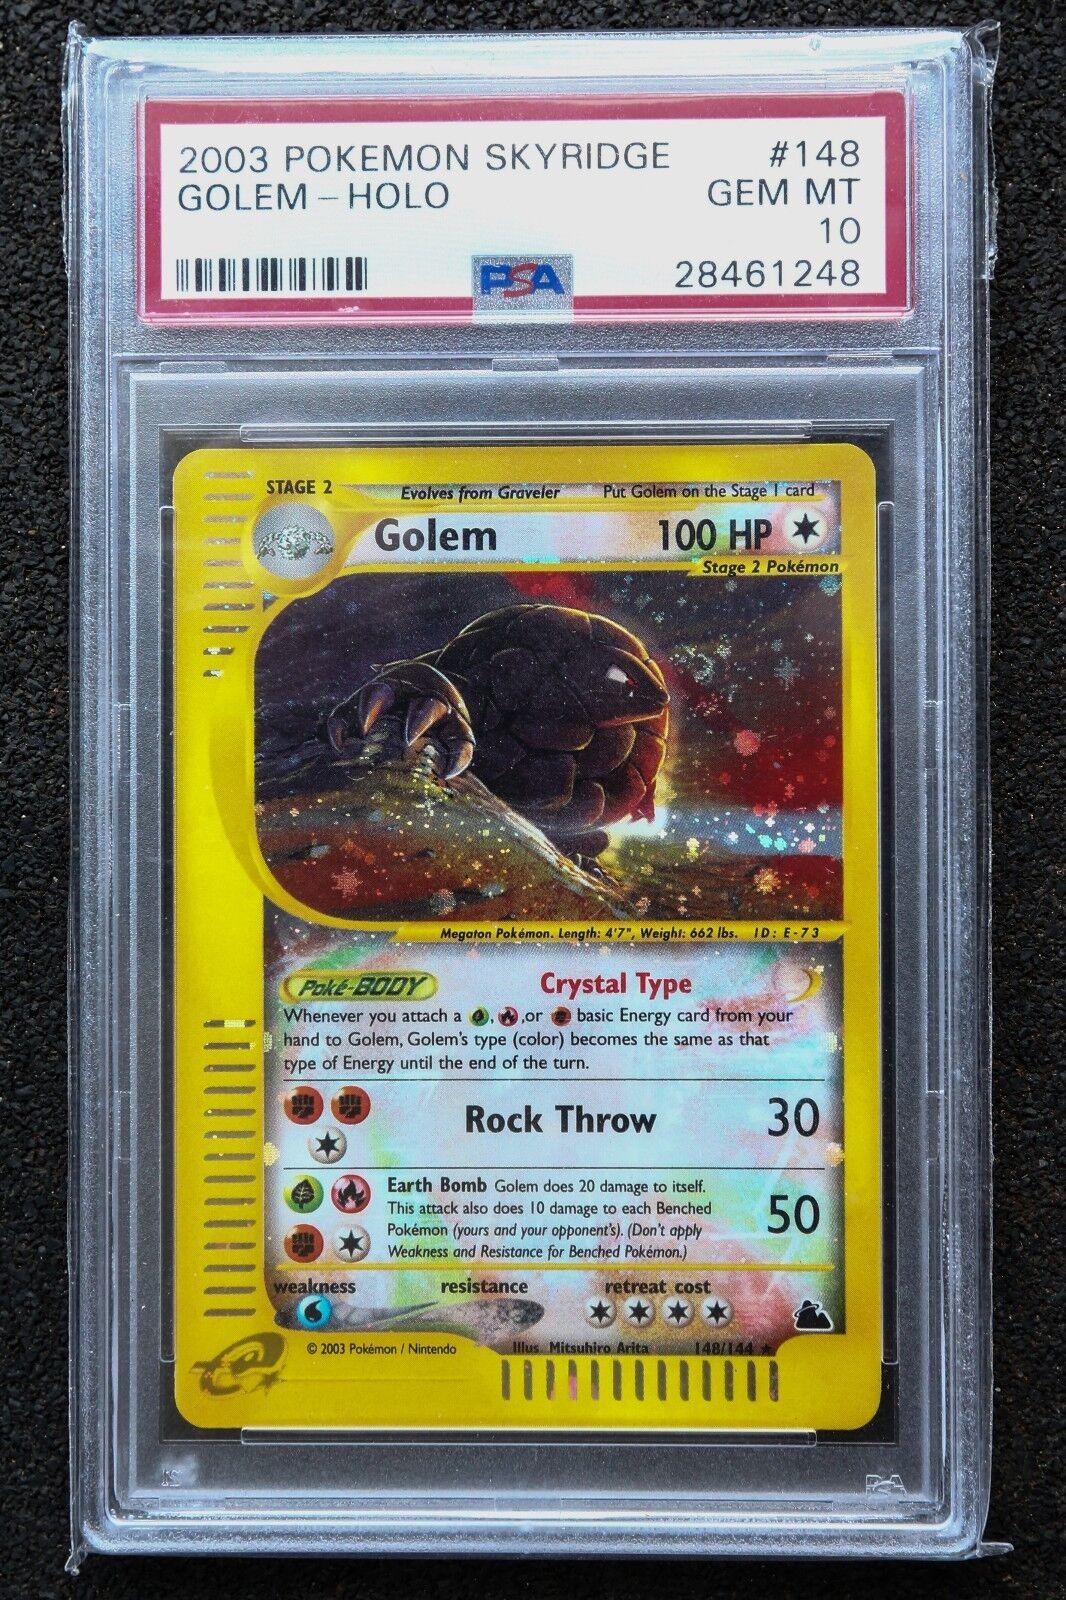 2003 Pokemon Skyridge Holo Golem Golem Golem 148 144 PSA 10 GEM MINT Secret Rare 60a4db